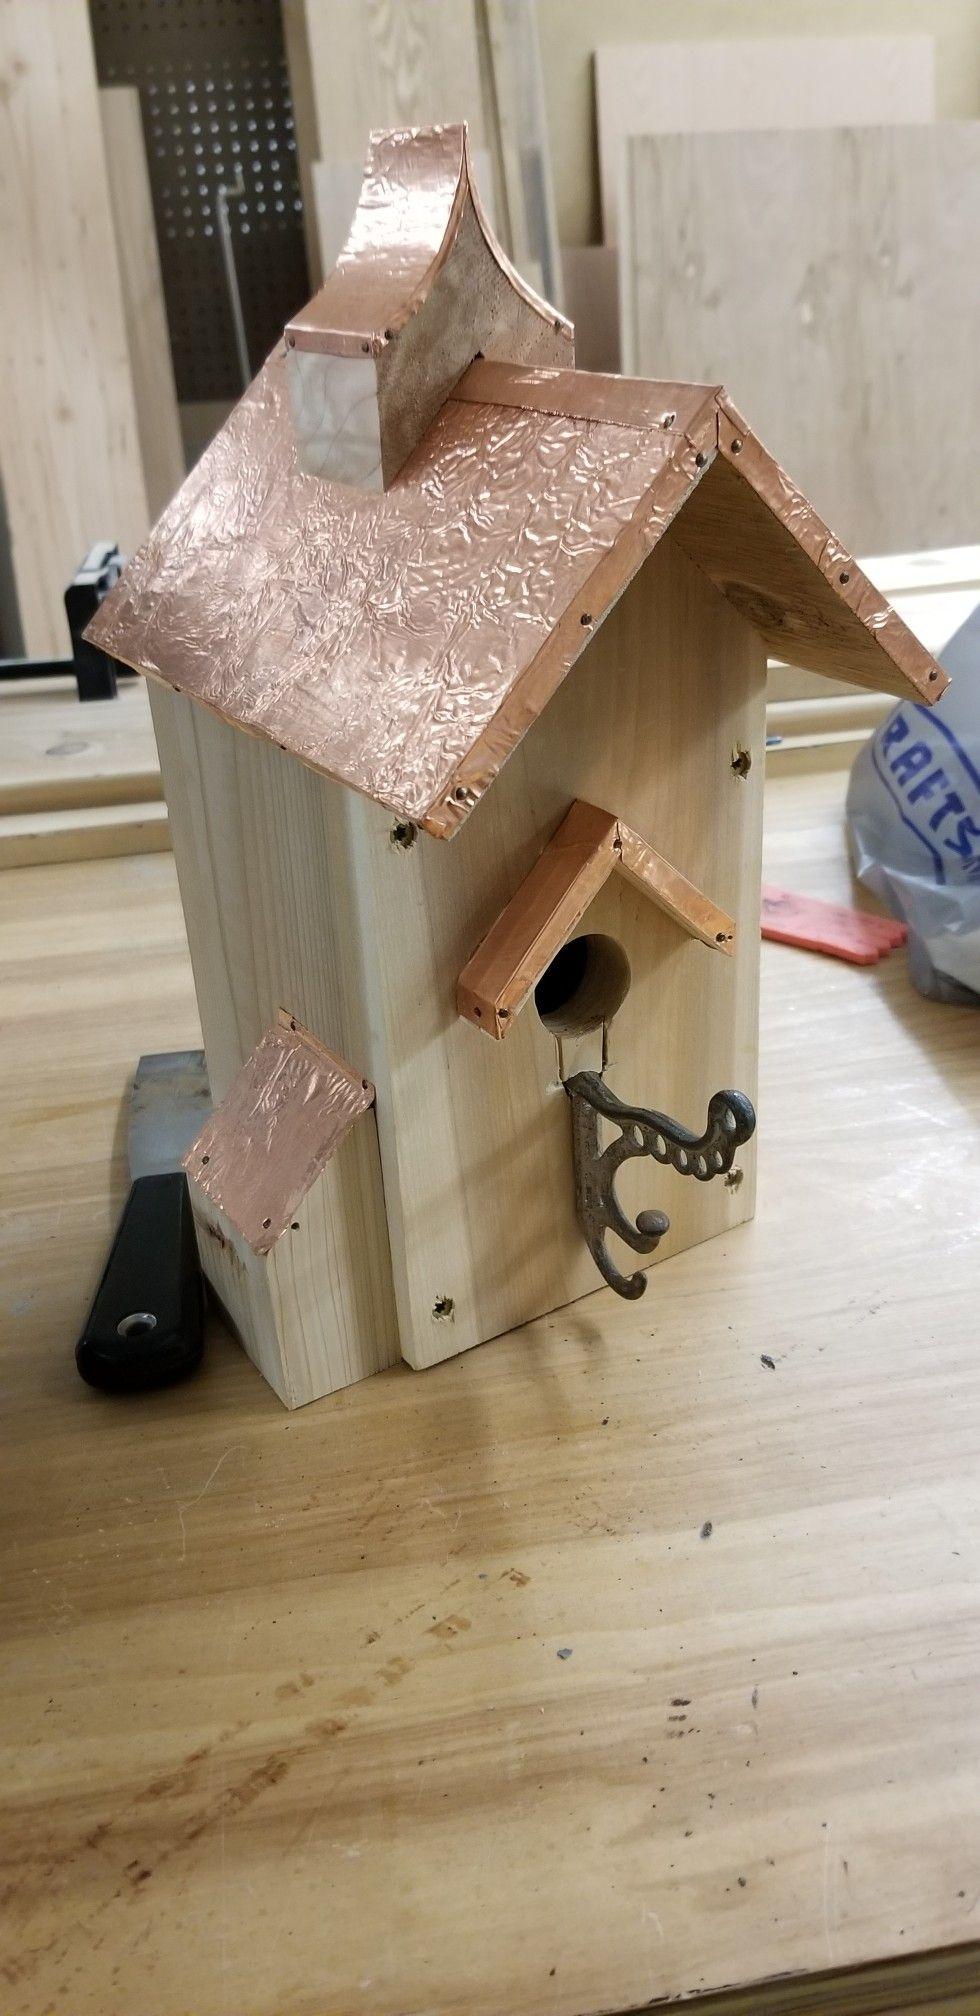 Cedar Birdhouse With Adhesive Backed Copper Sheet Roof Unique Bird Houses Bird Houses Diy Decorative Bird Houses